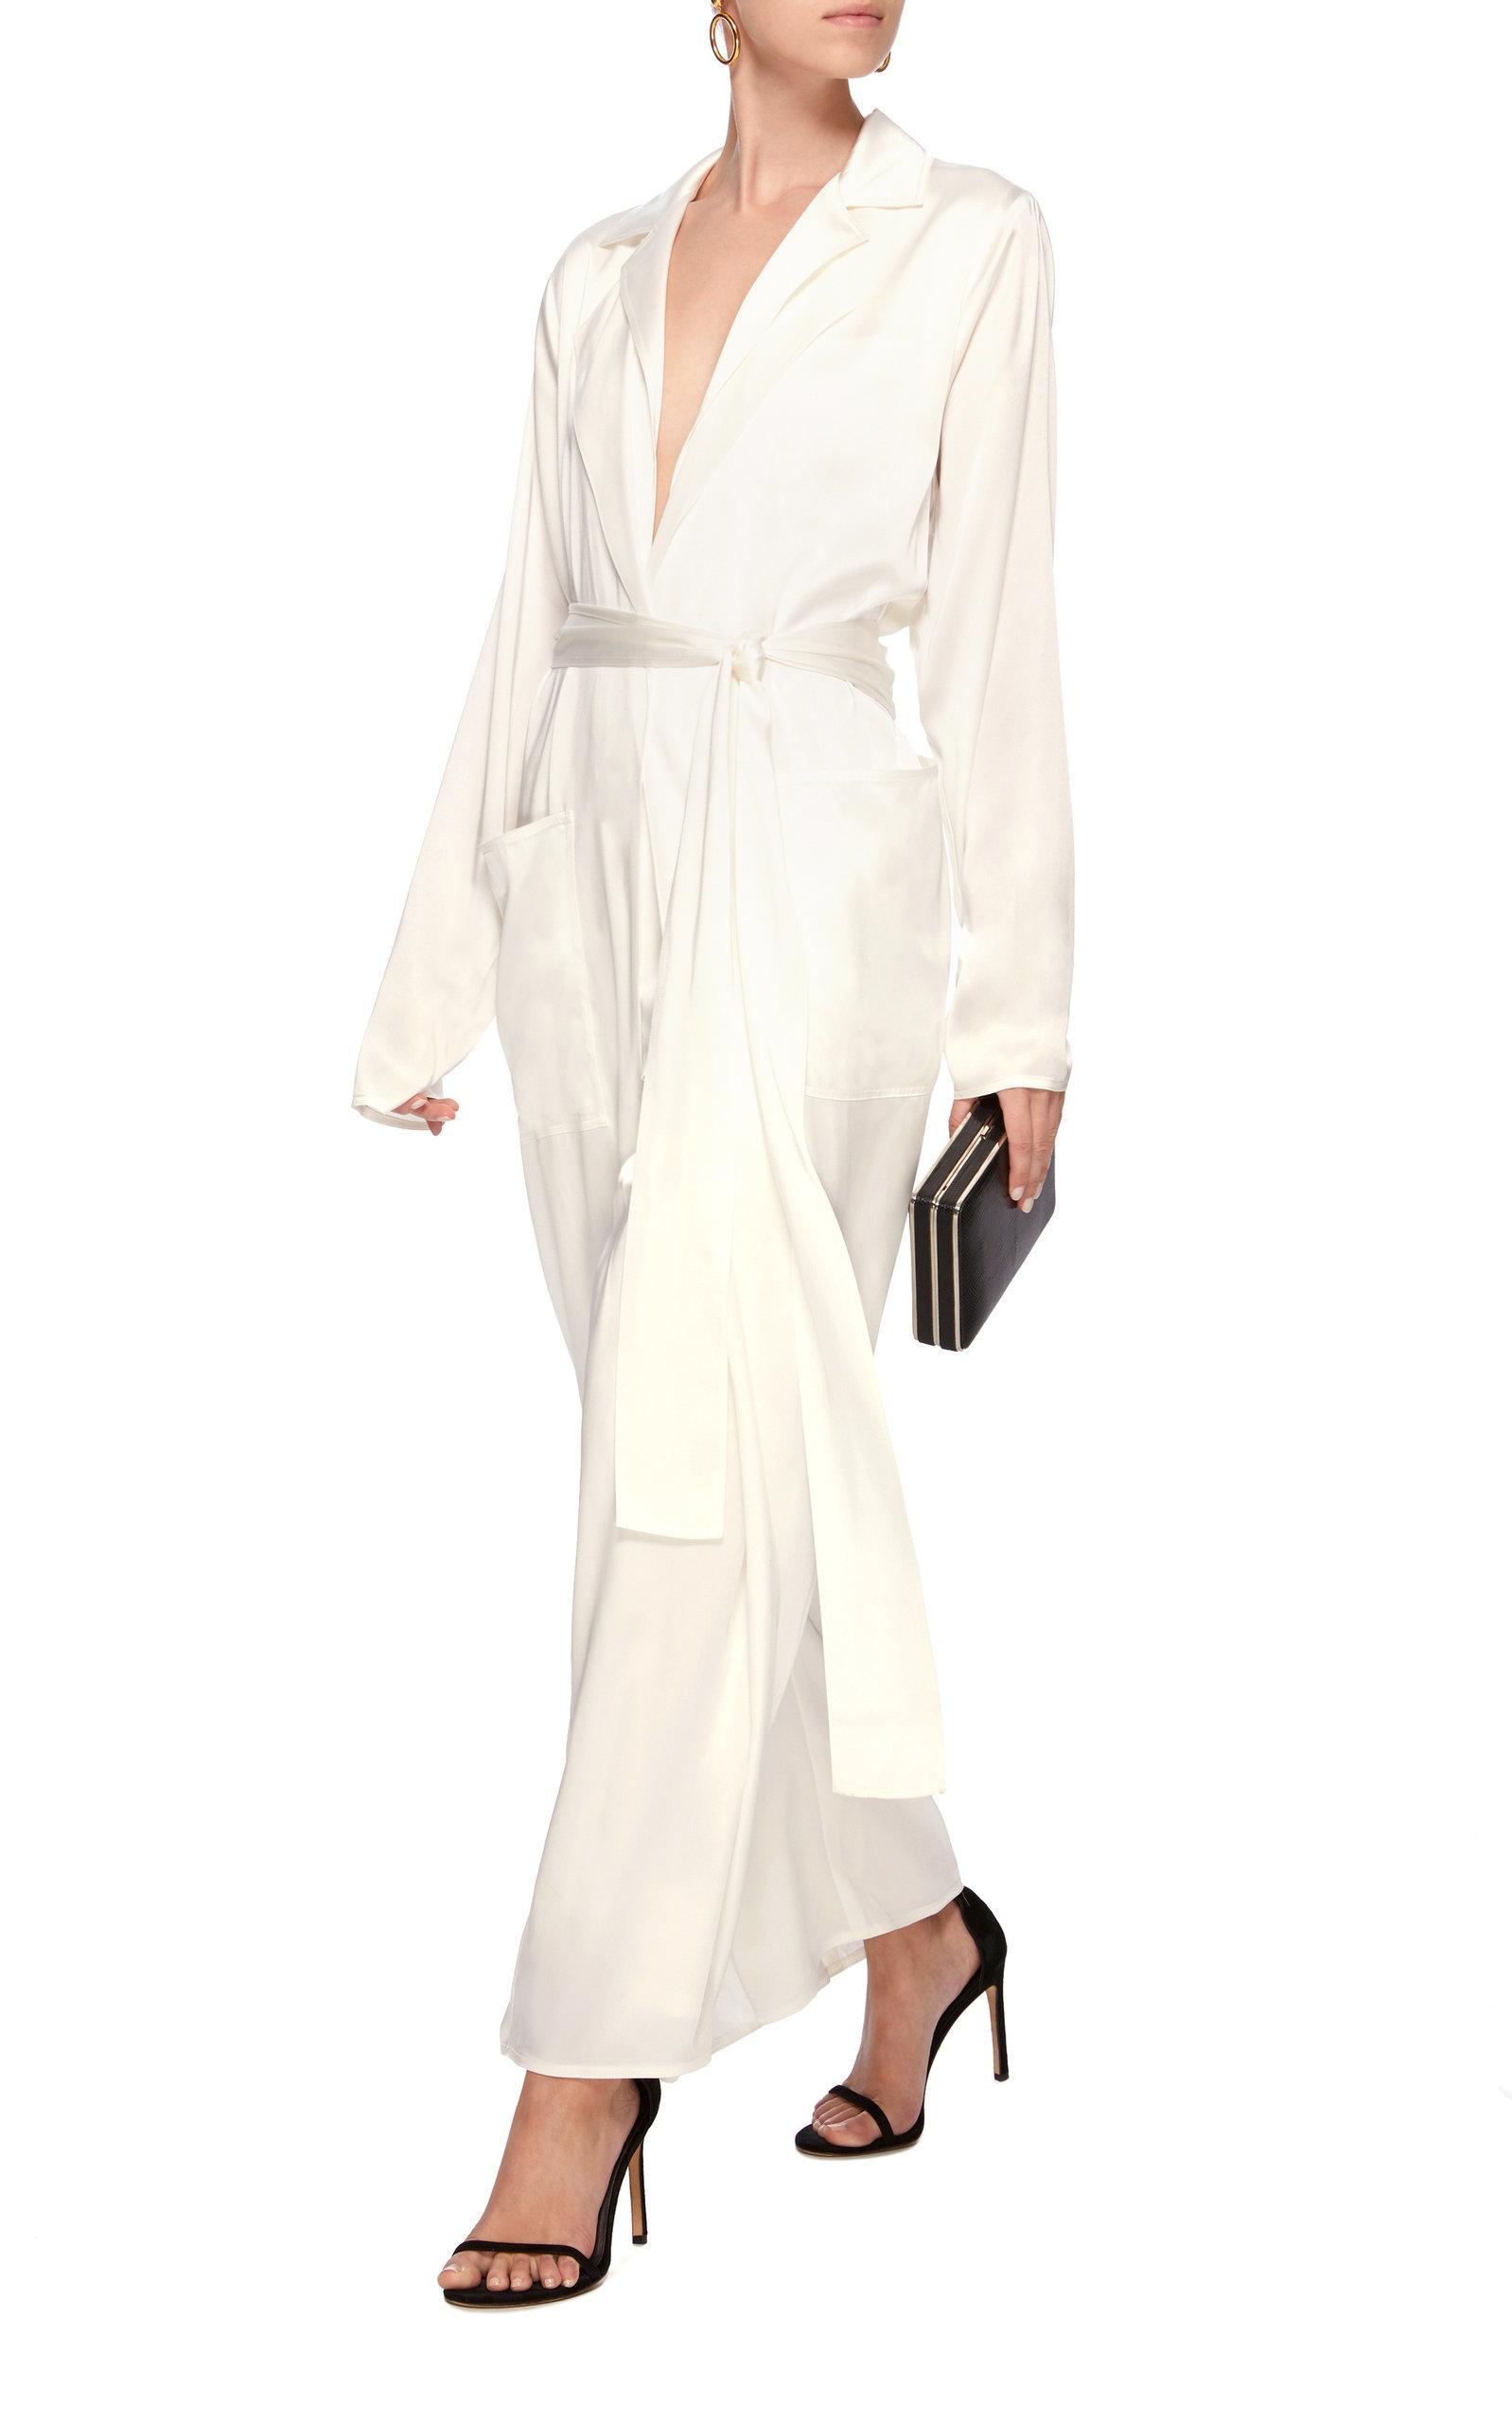 c99fa69cea8 Ralph Lauren - White O reilly Charmeuse Jumpsuit - Lyst. View fullscreen